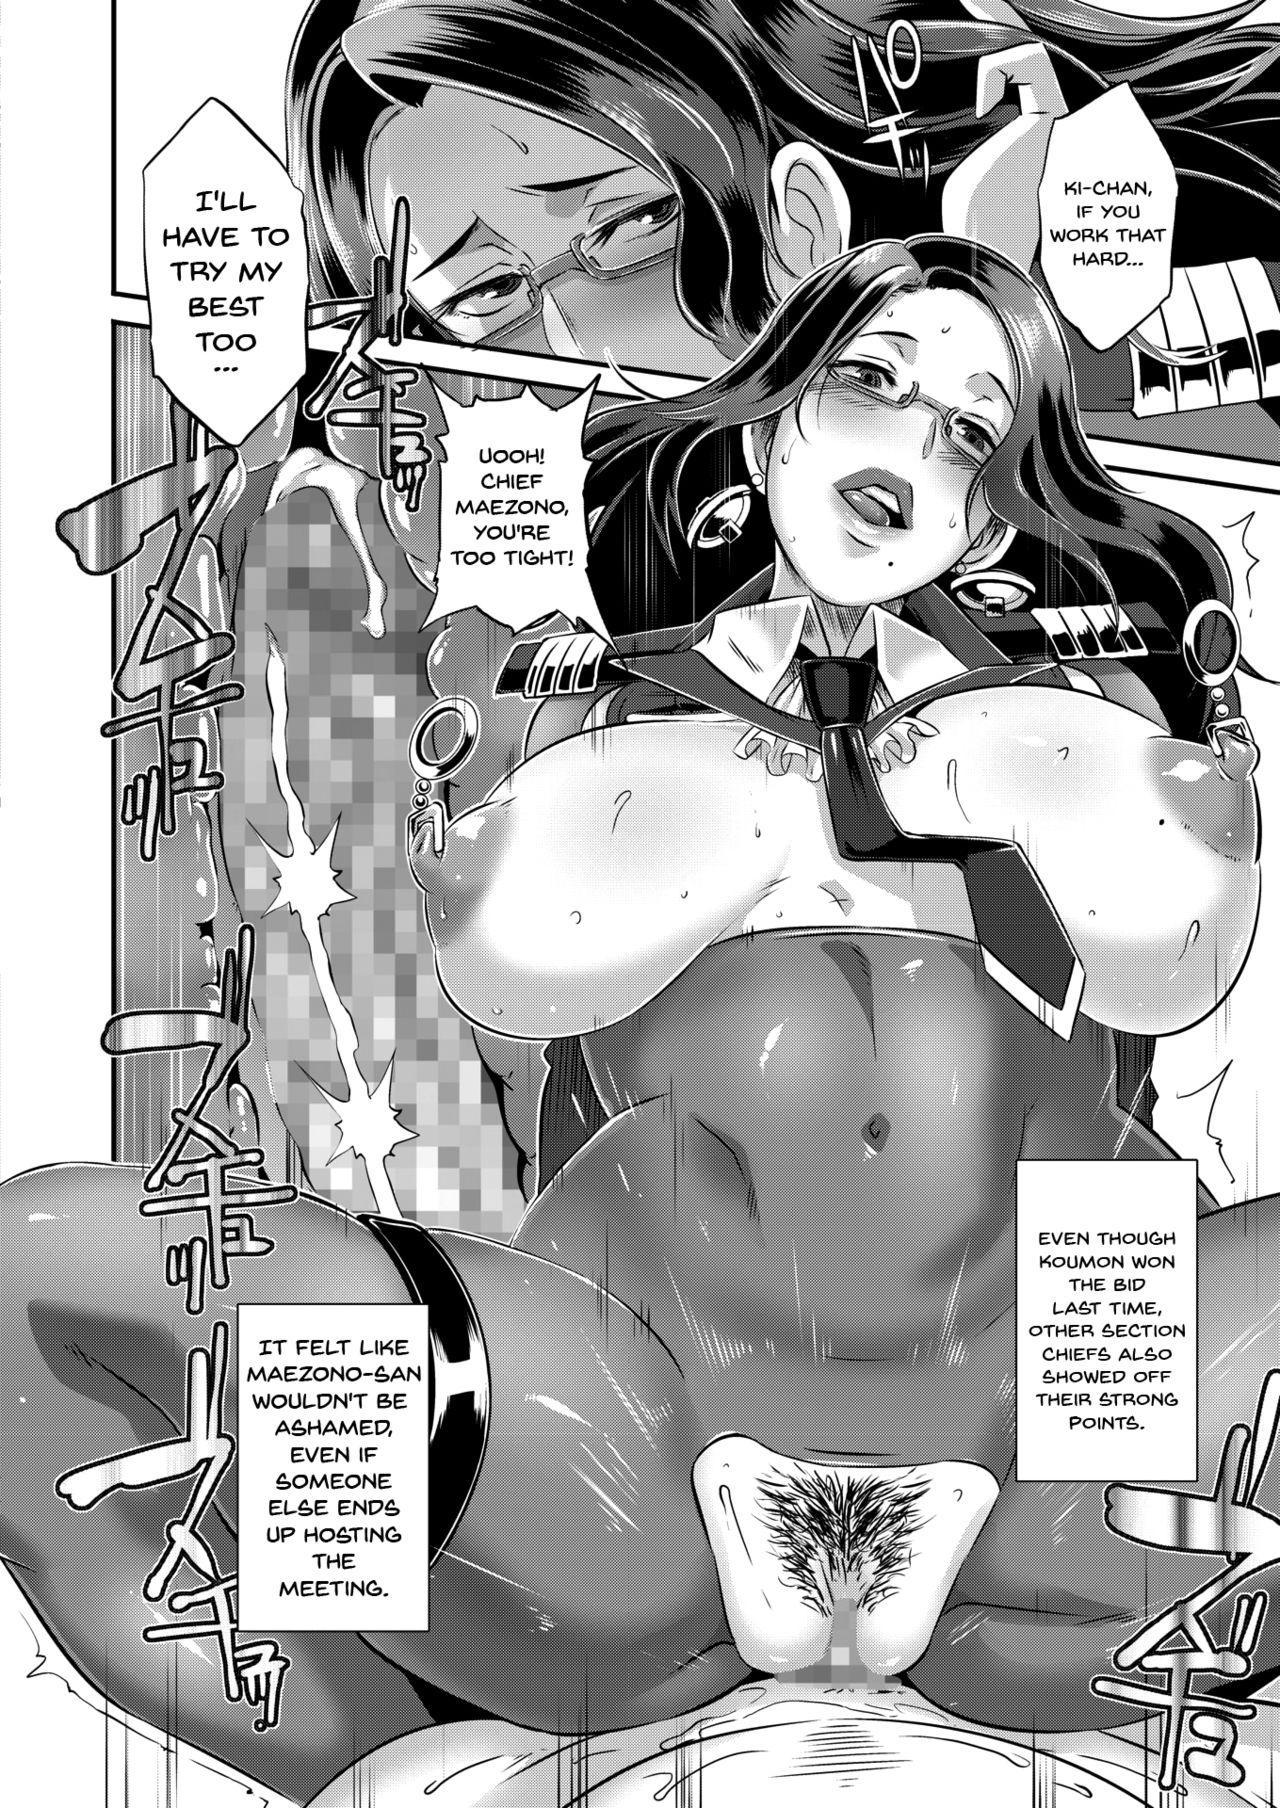 [Butcha-U] SDPO ~Seimukan no Susume~ | SDPO ~Sexual Desire Processing Officer~ (COMIC Megastore Alpha 2017-09) [English] [Doujins.com] [Digital] 15